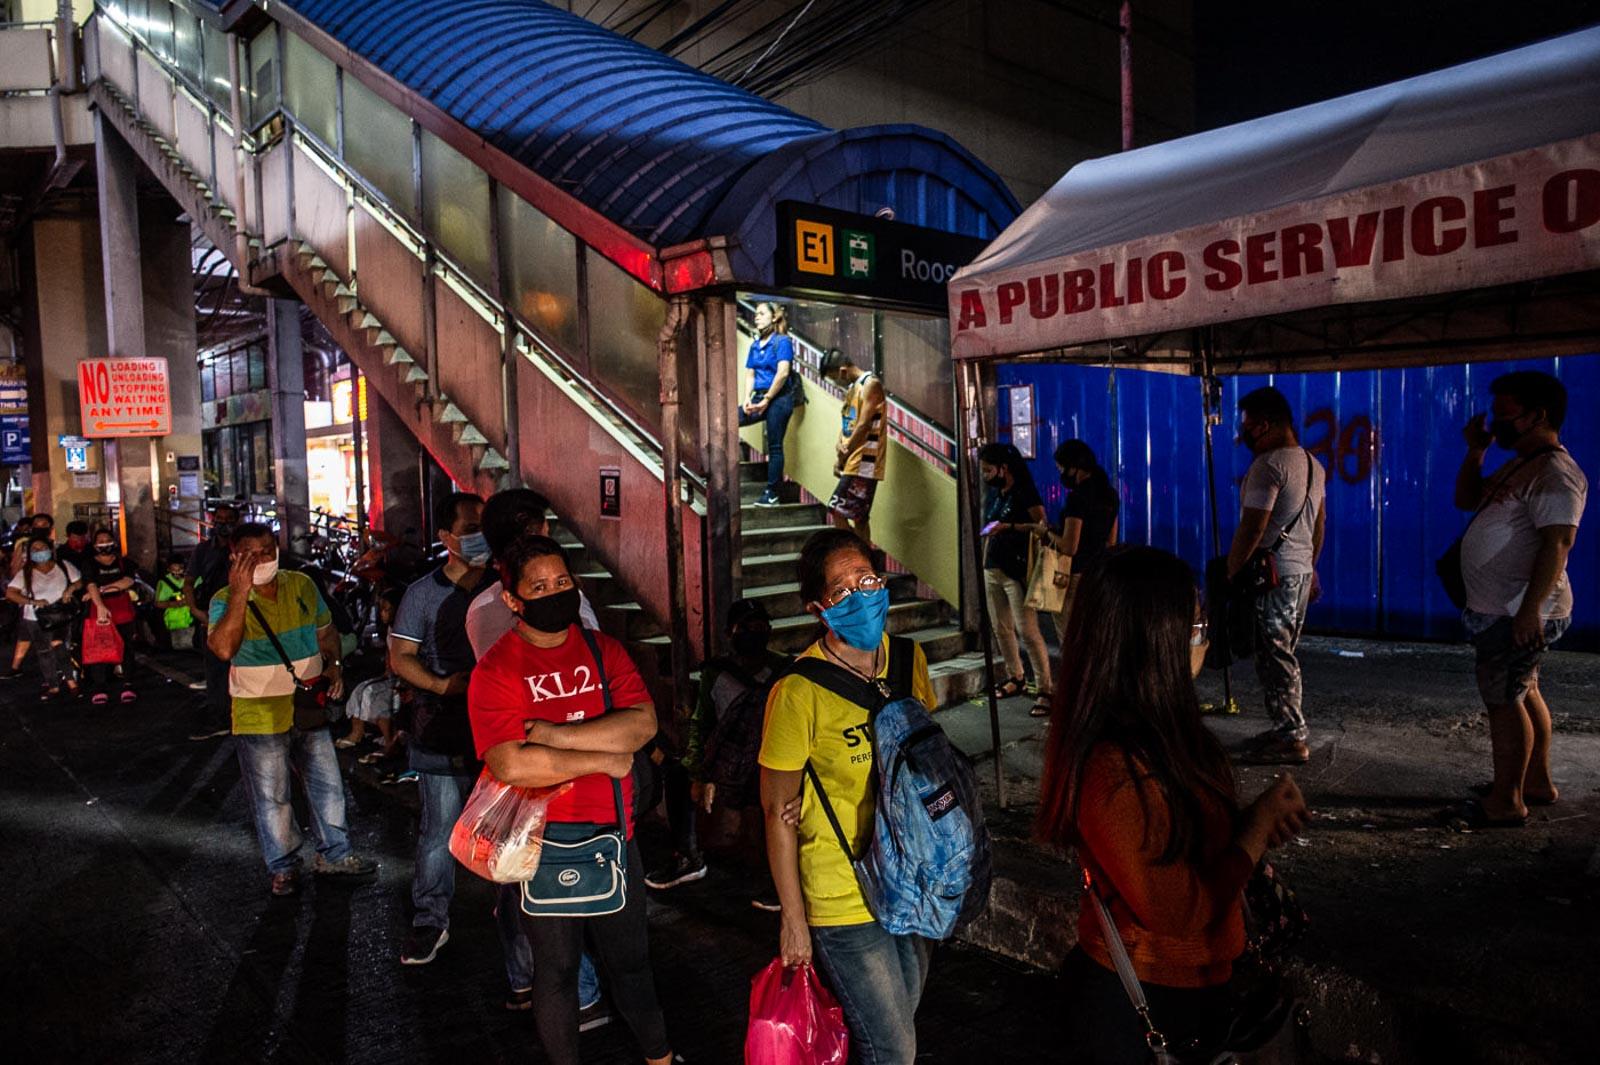 Philippines coronavirus cases climb further over 57,000 - Rappler